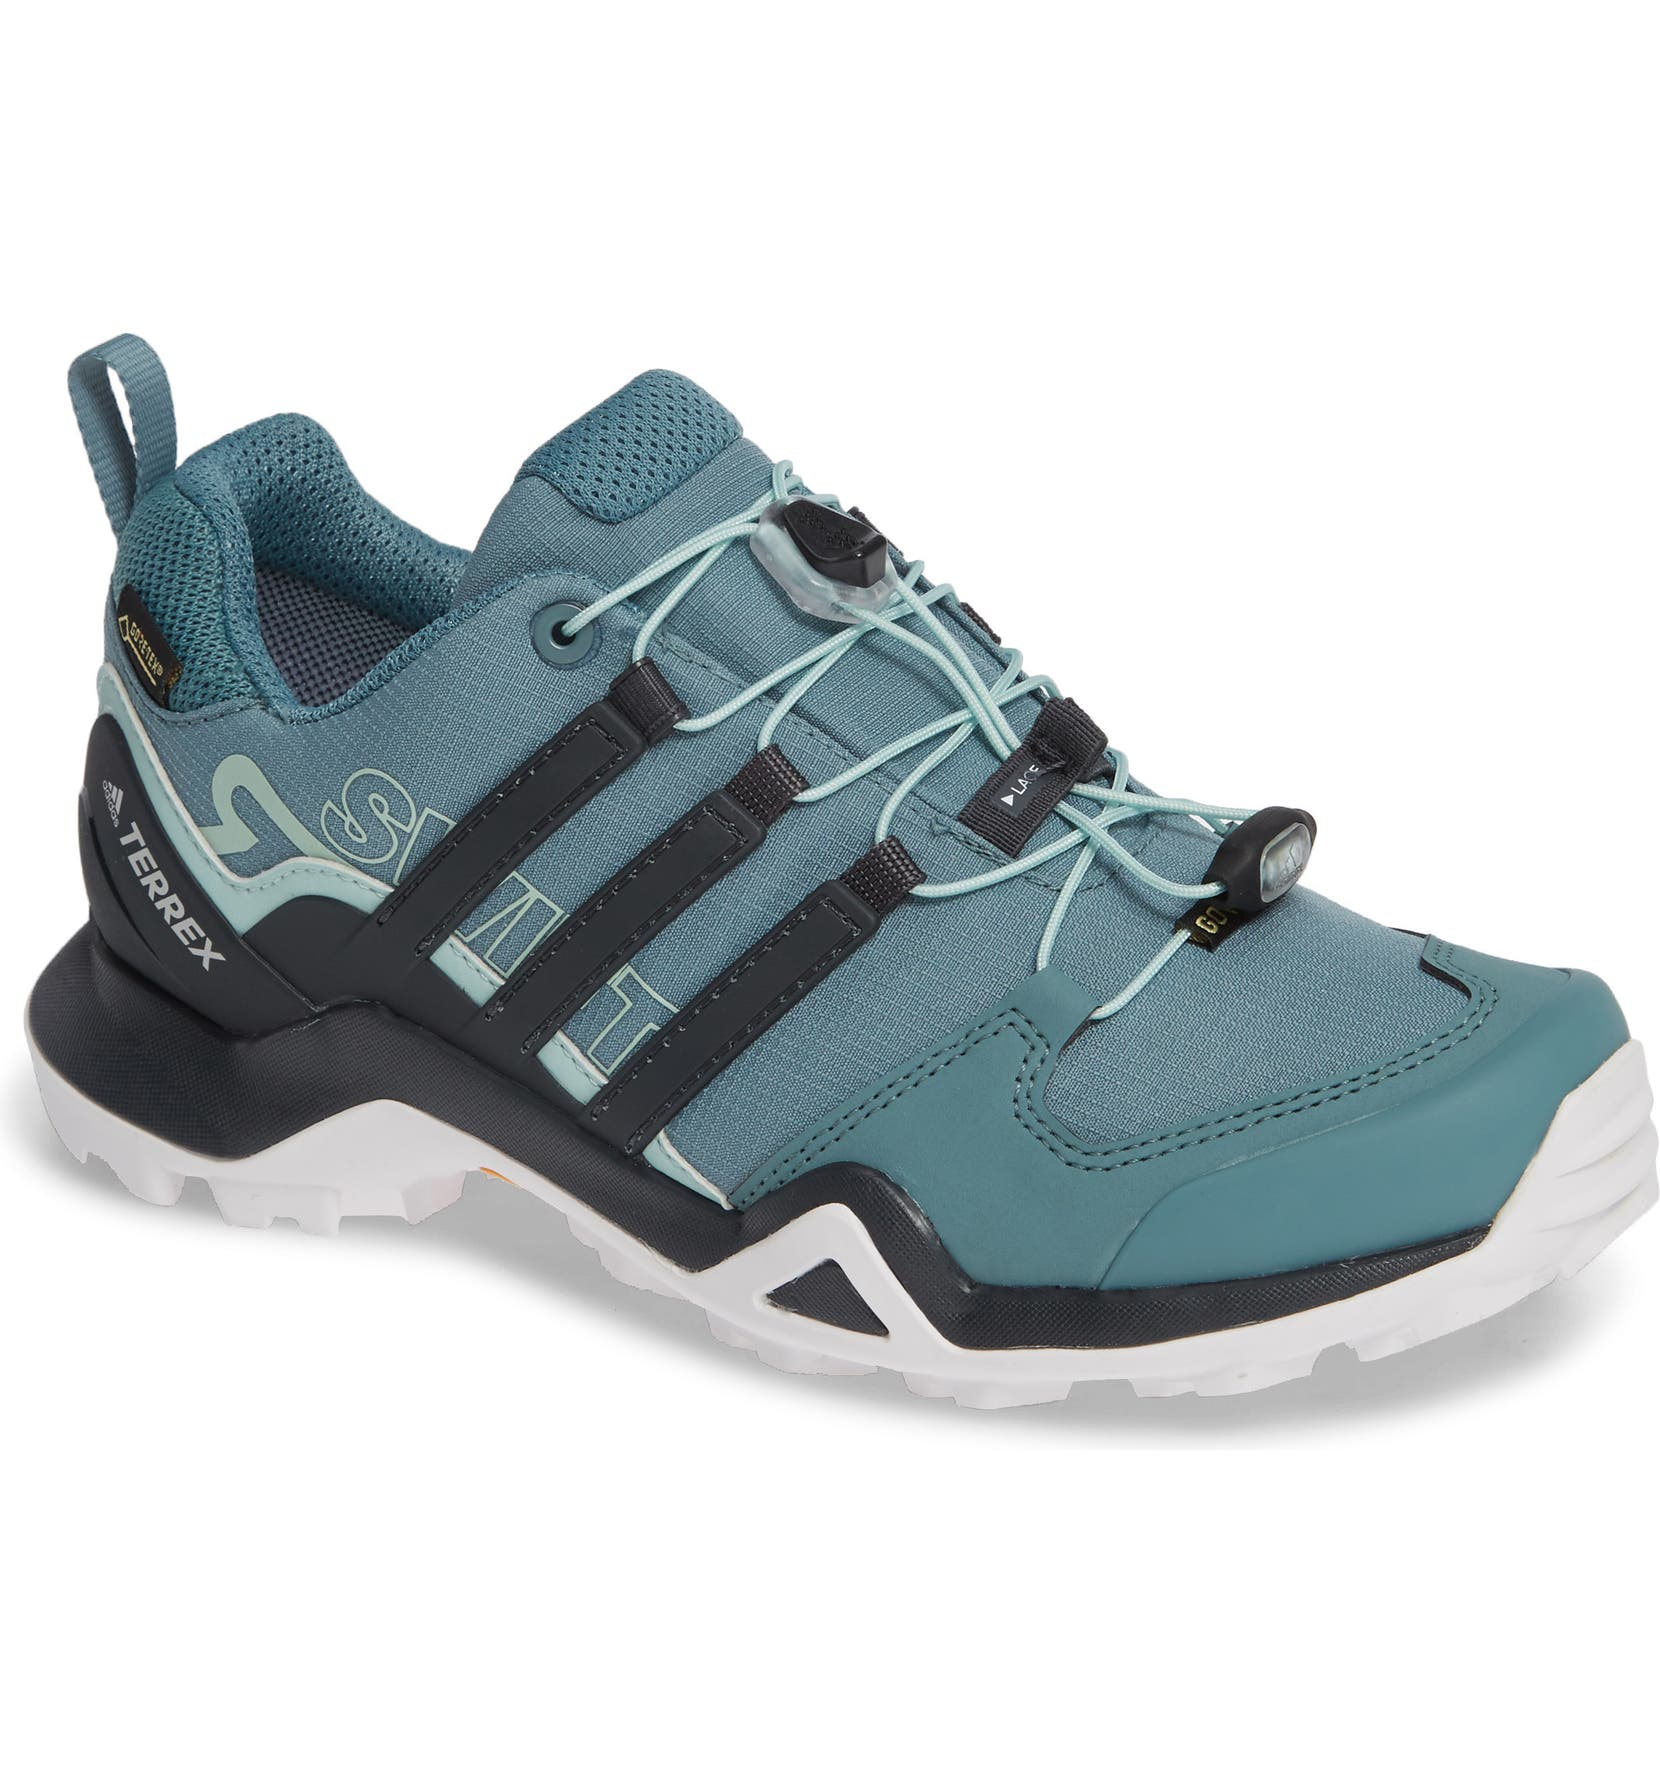 94f89475c1ce adidas Terrex Swift R2 GTX Gore-Tex® Waterproof Hiking Shoe (Women ...